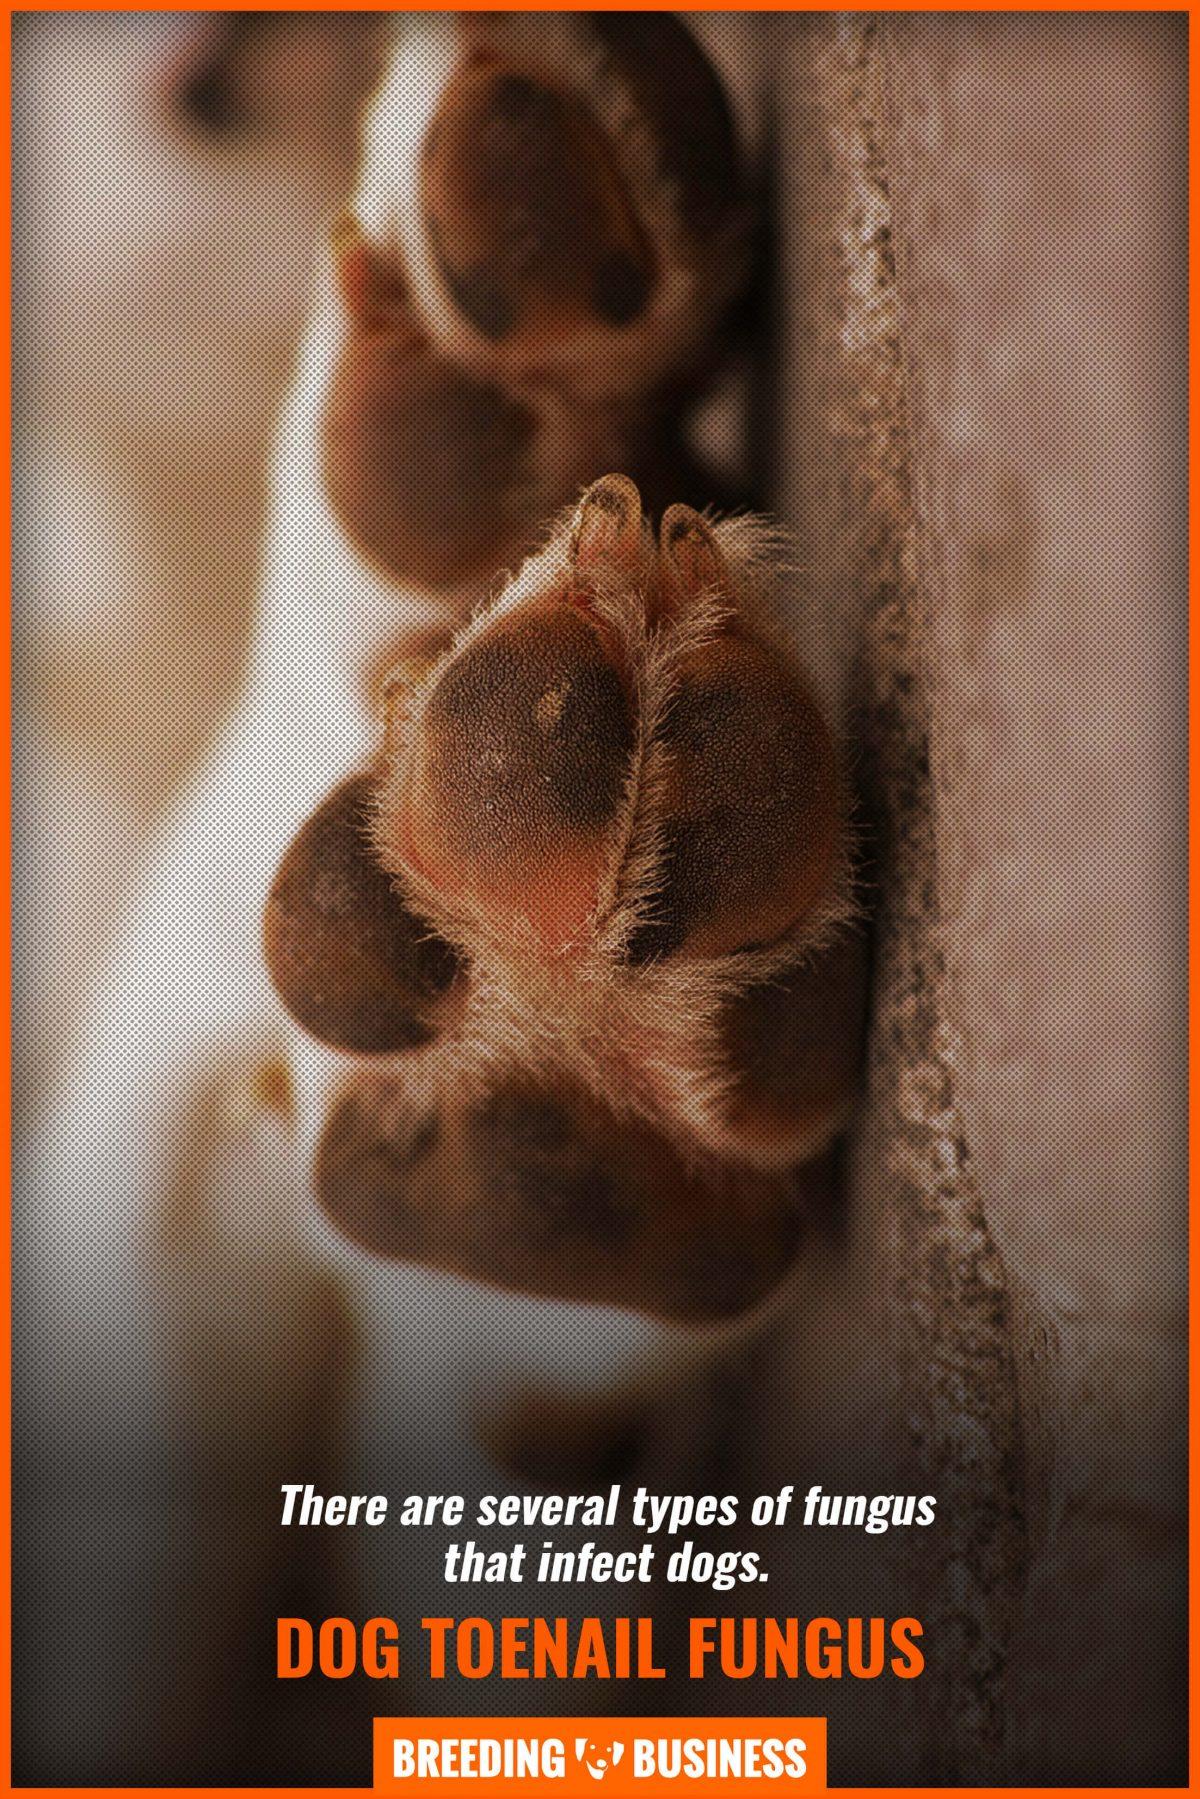 dog toenail fungus